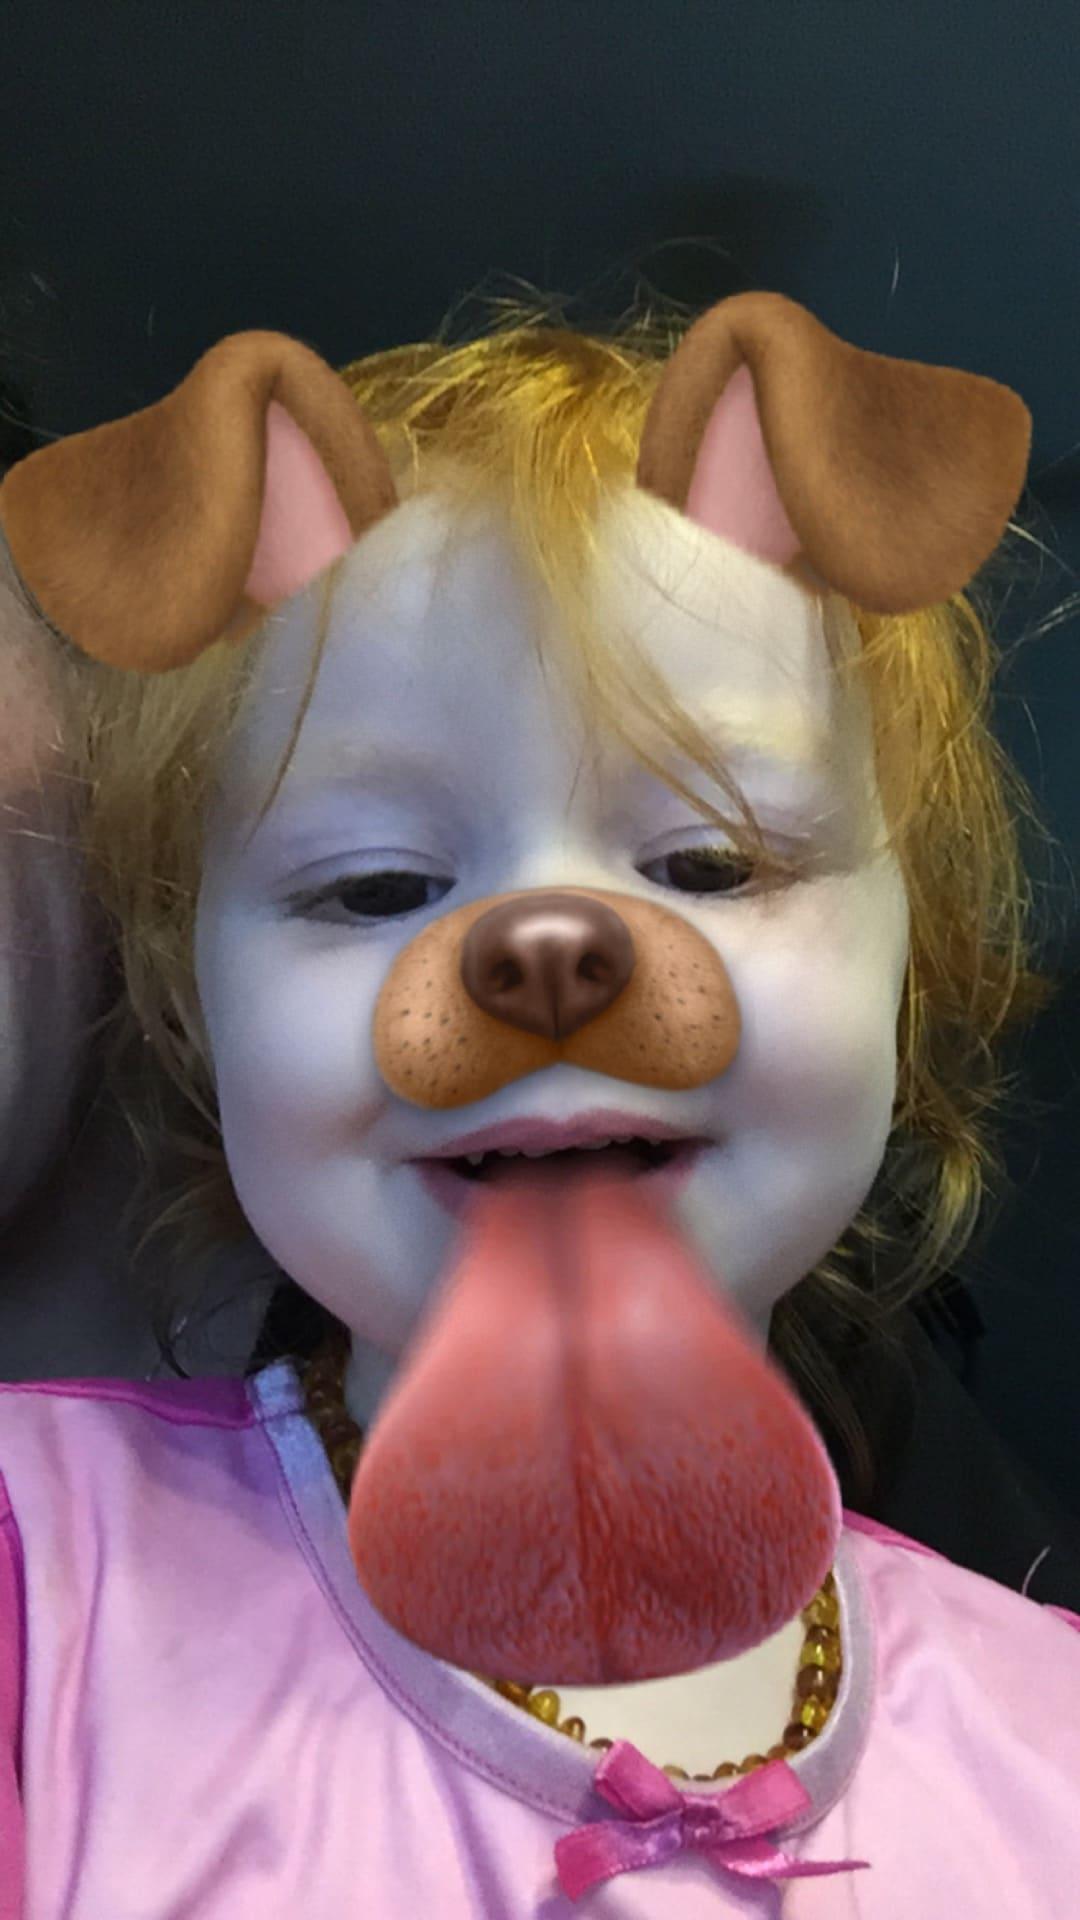 Snapchat fun with B